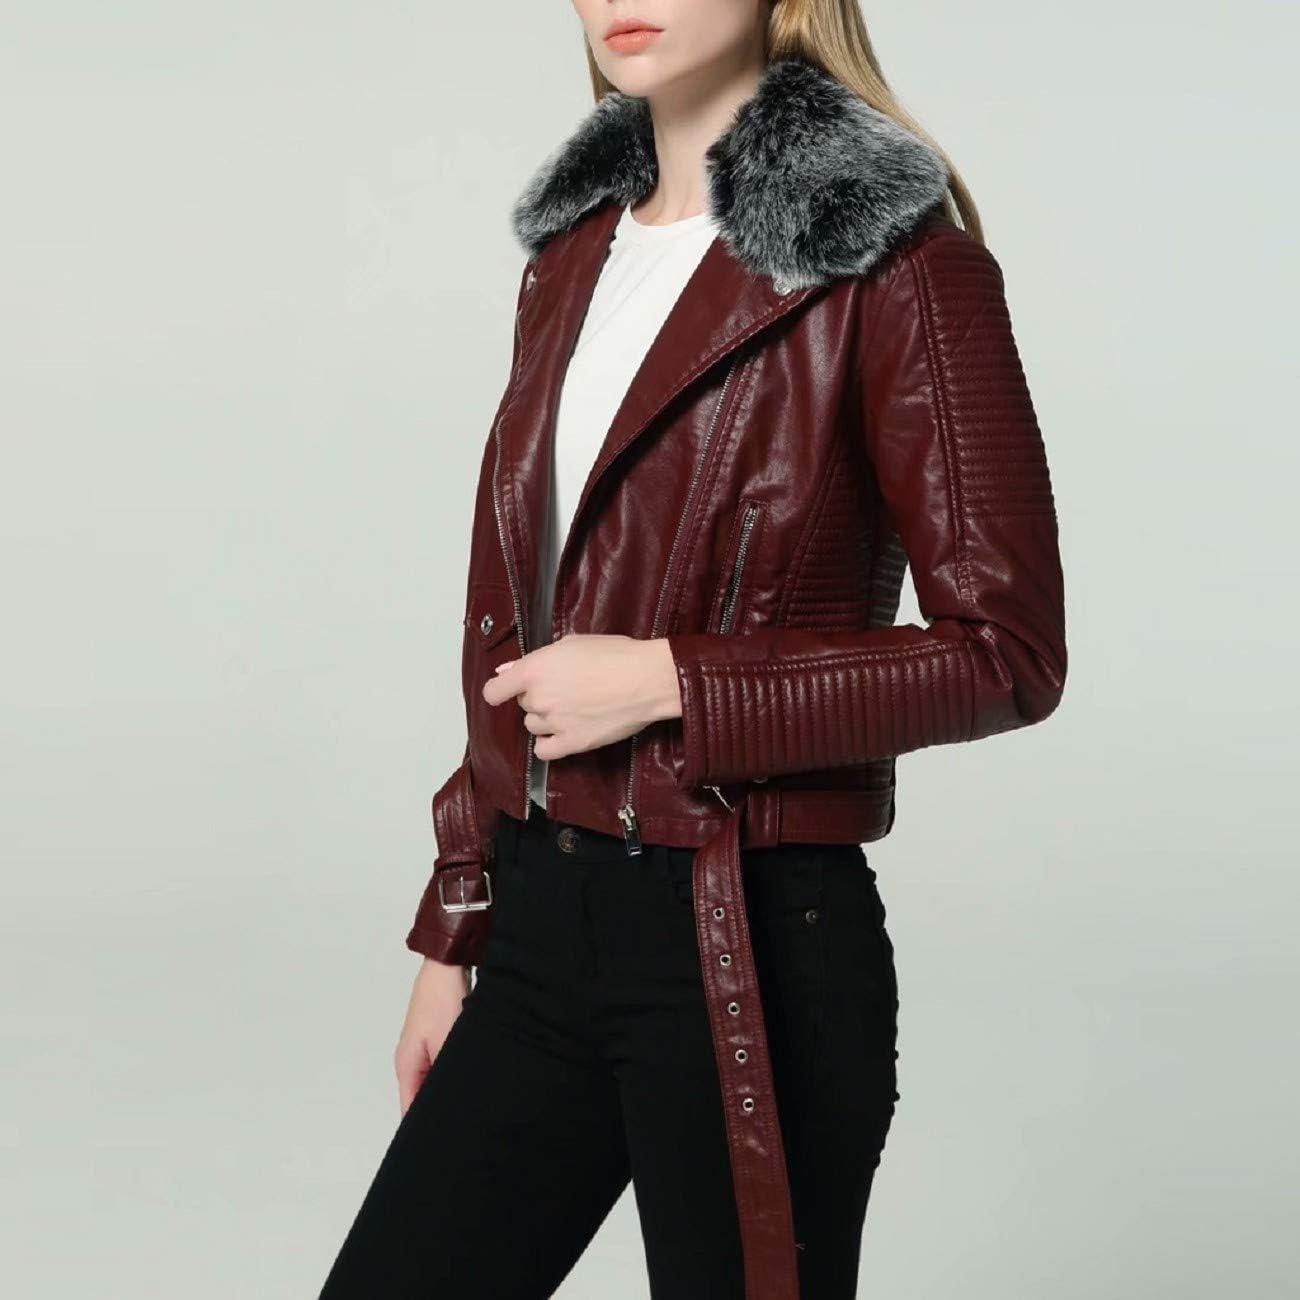 FAPIZI Womens Faux Leather Jacket Fashion Lapel Long Sleeve Zip up Belt Moto Jacket Coat Slim Outwear with Fur Collar